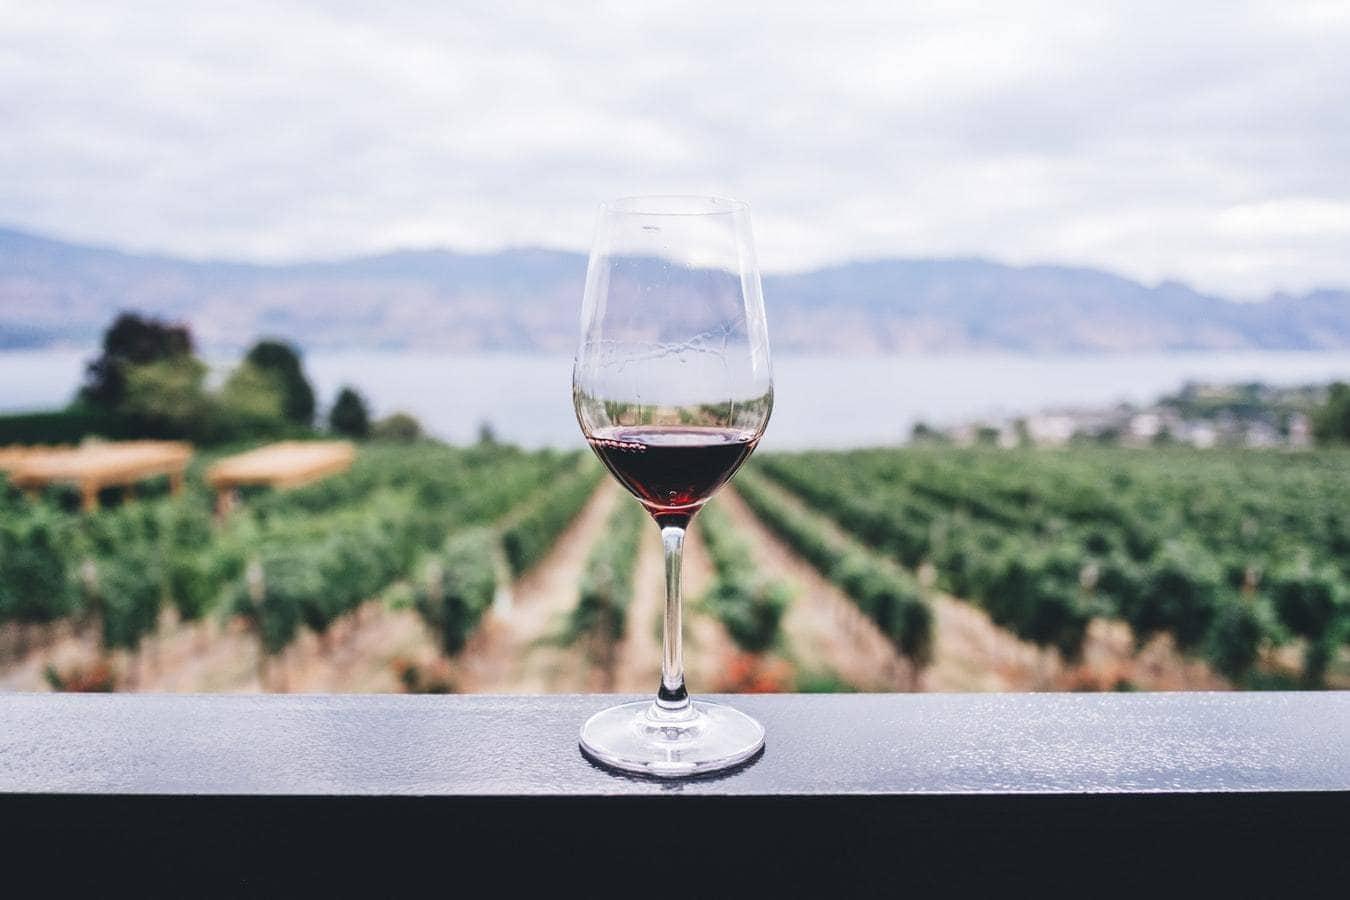 lampka wina a zdrowie